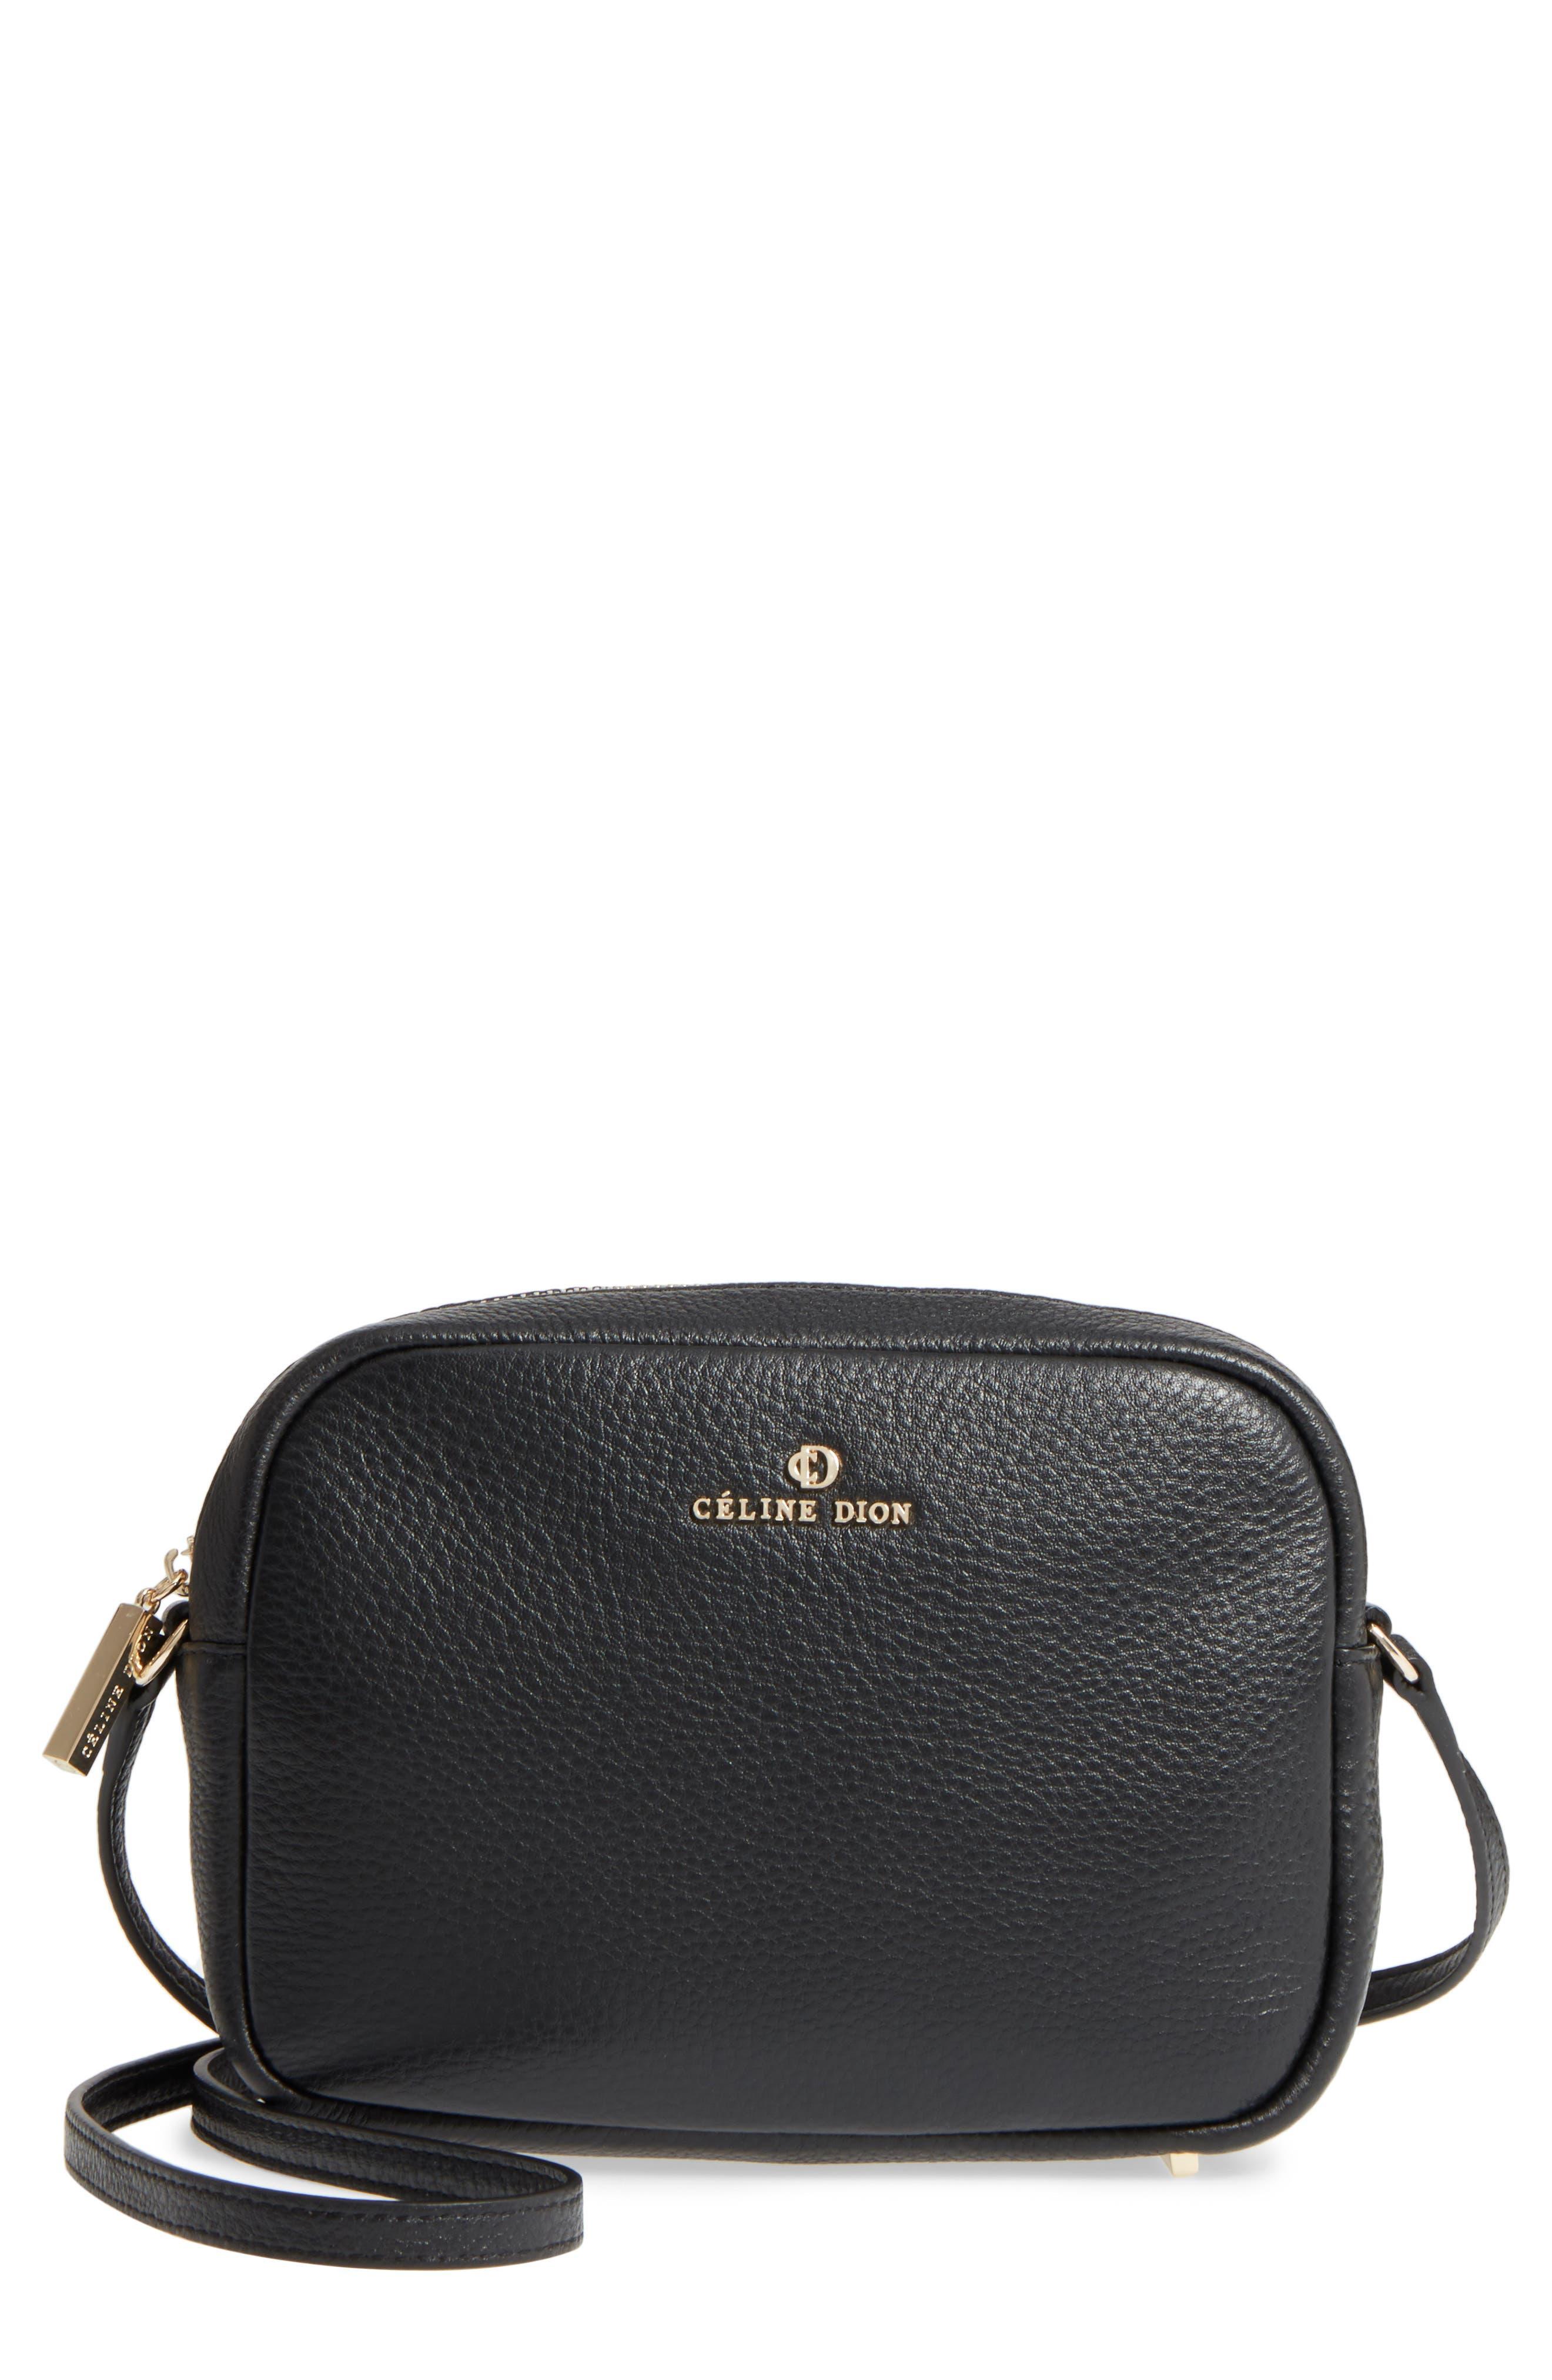 Céline Dion Adagio Leather Camera Crossbody Bag,                             Main thumbnail 1, color,